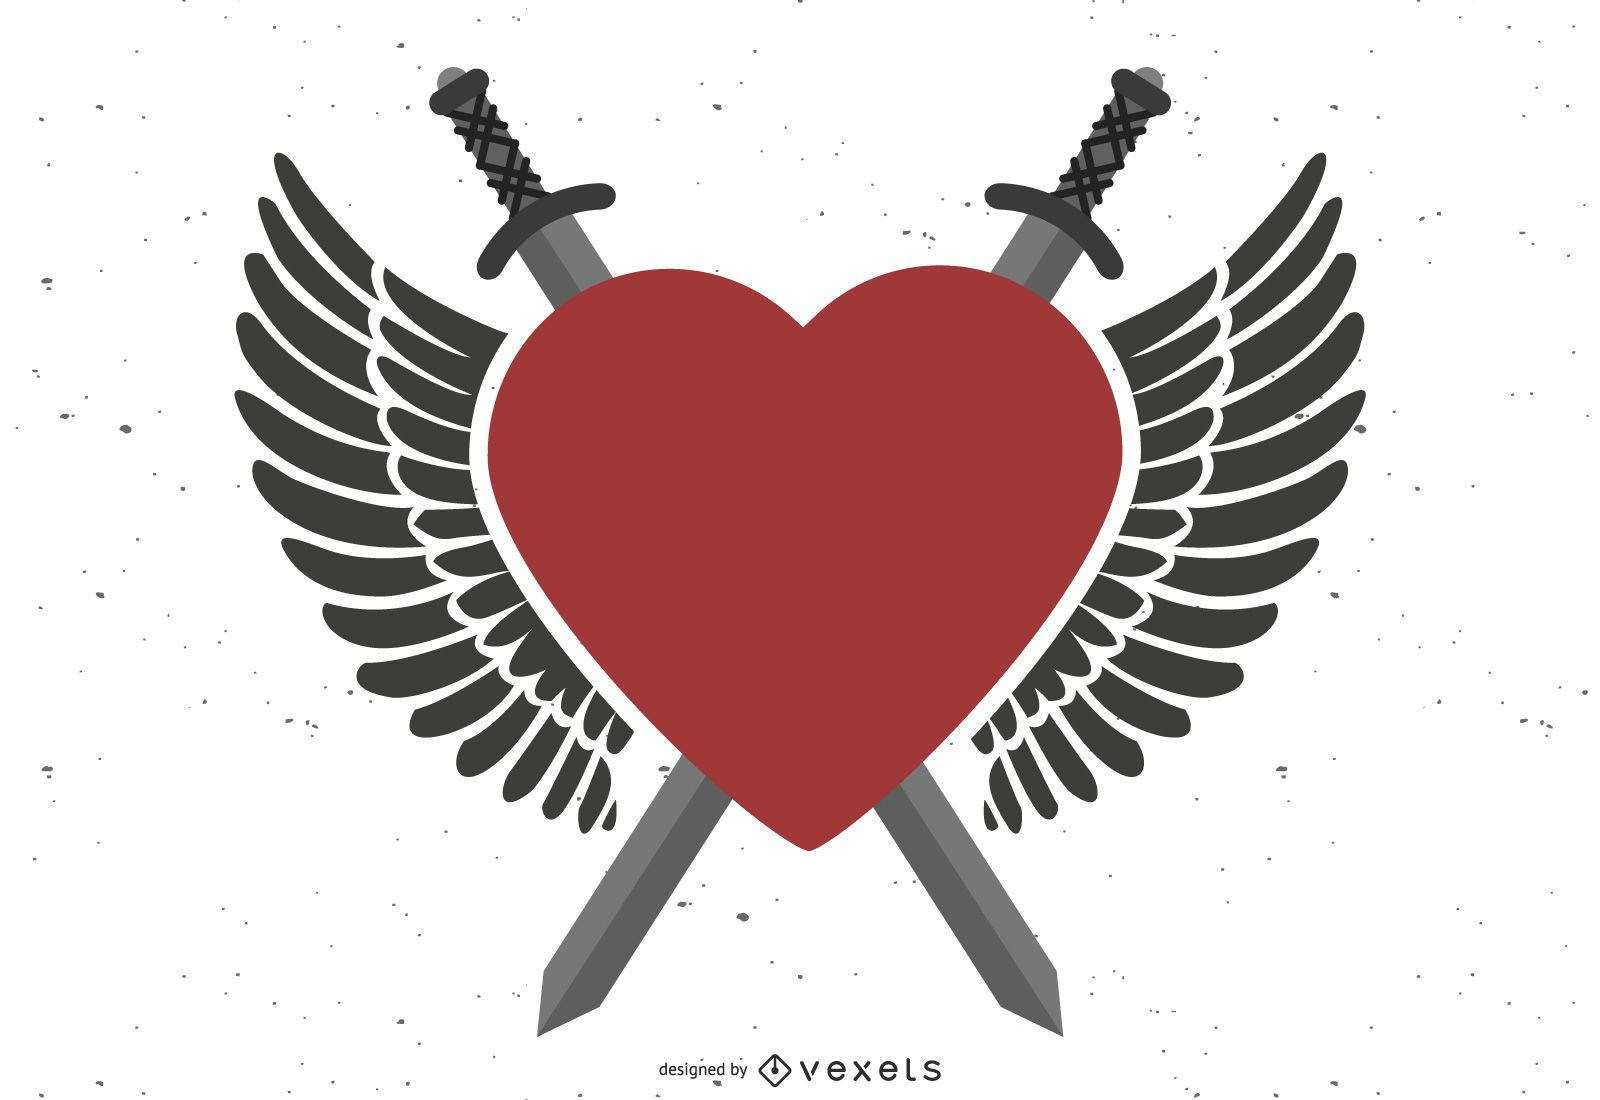 Mighty Winged Heart Crossed Swords